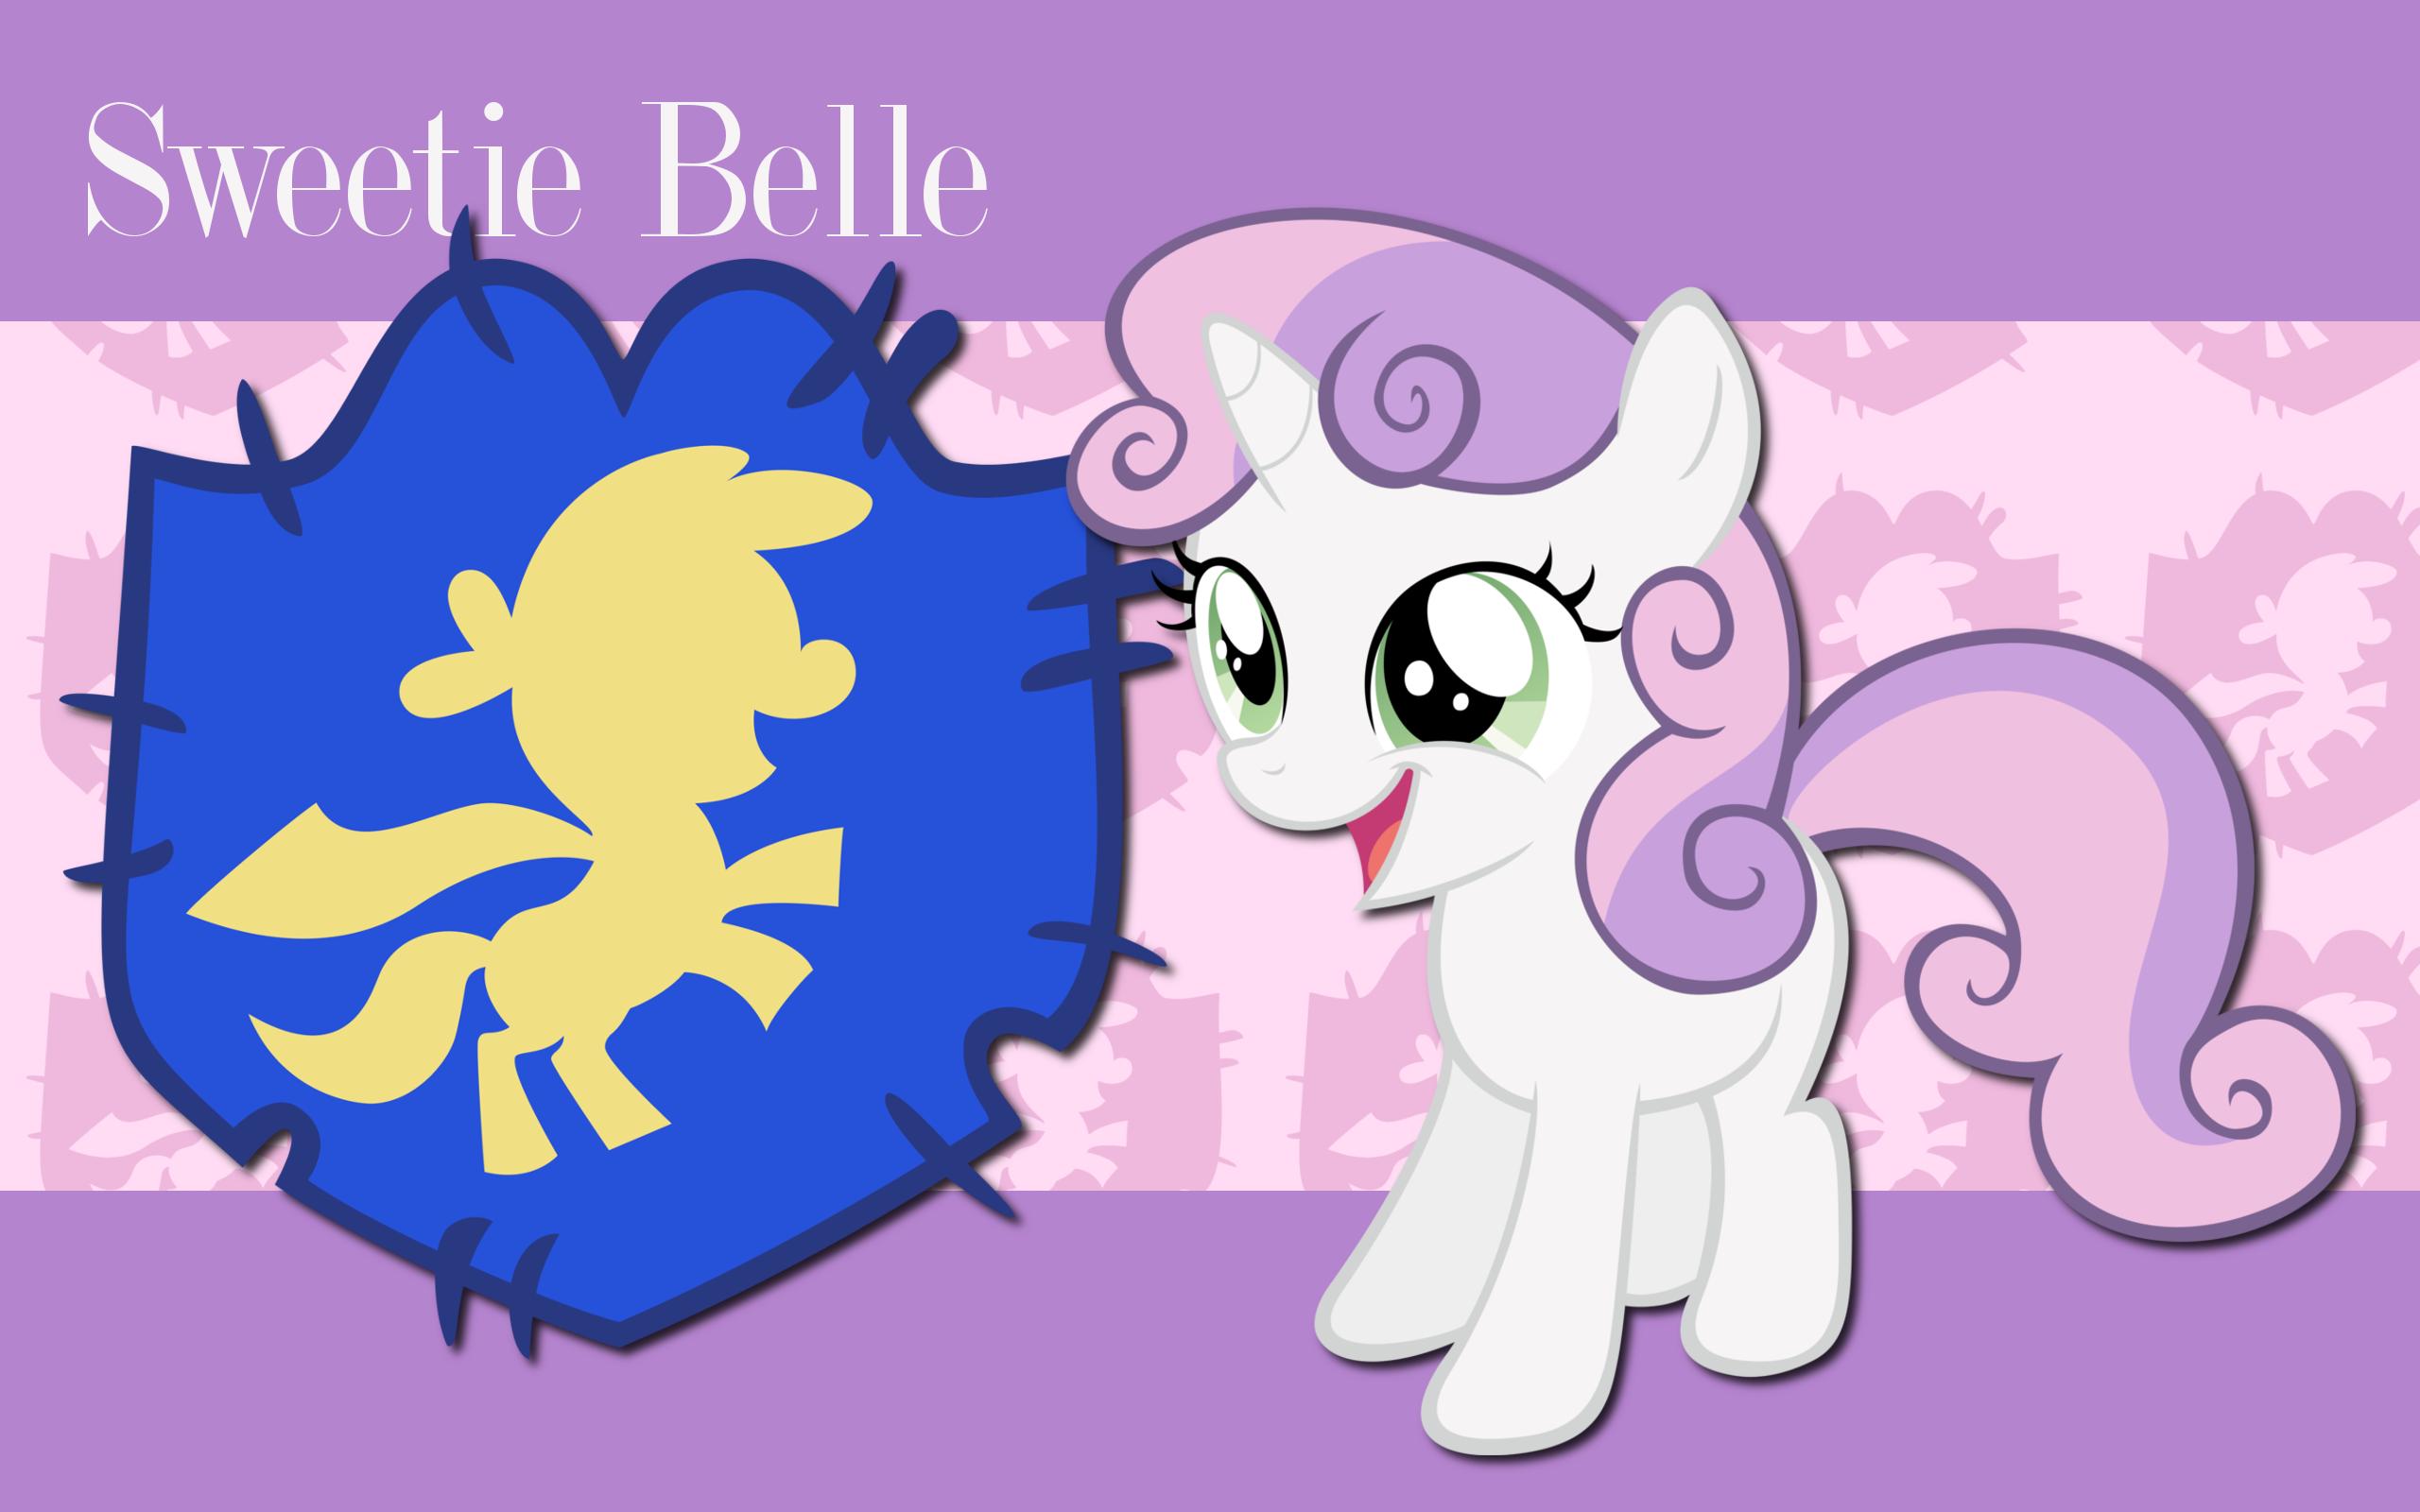 Sweetie Belle WP 3 by AliceHumanSacrifice0, AtomicGreymon and RyantheBrony